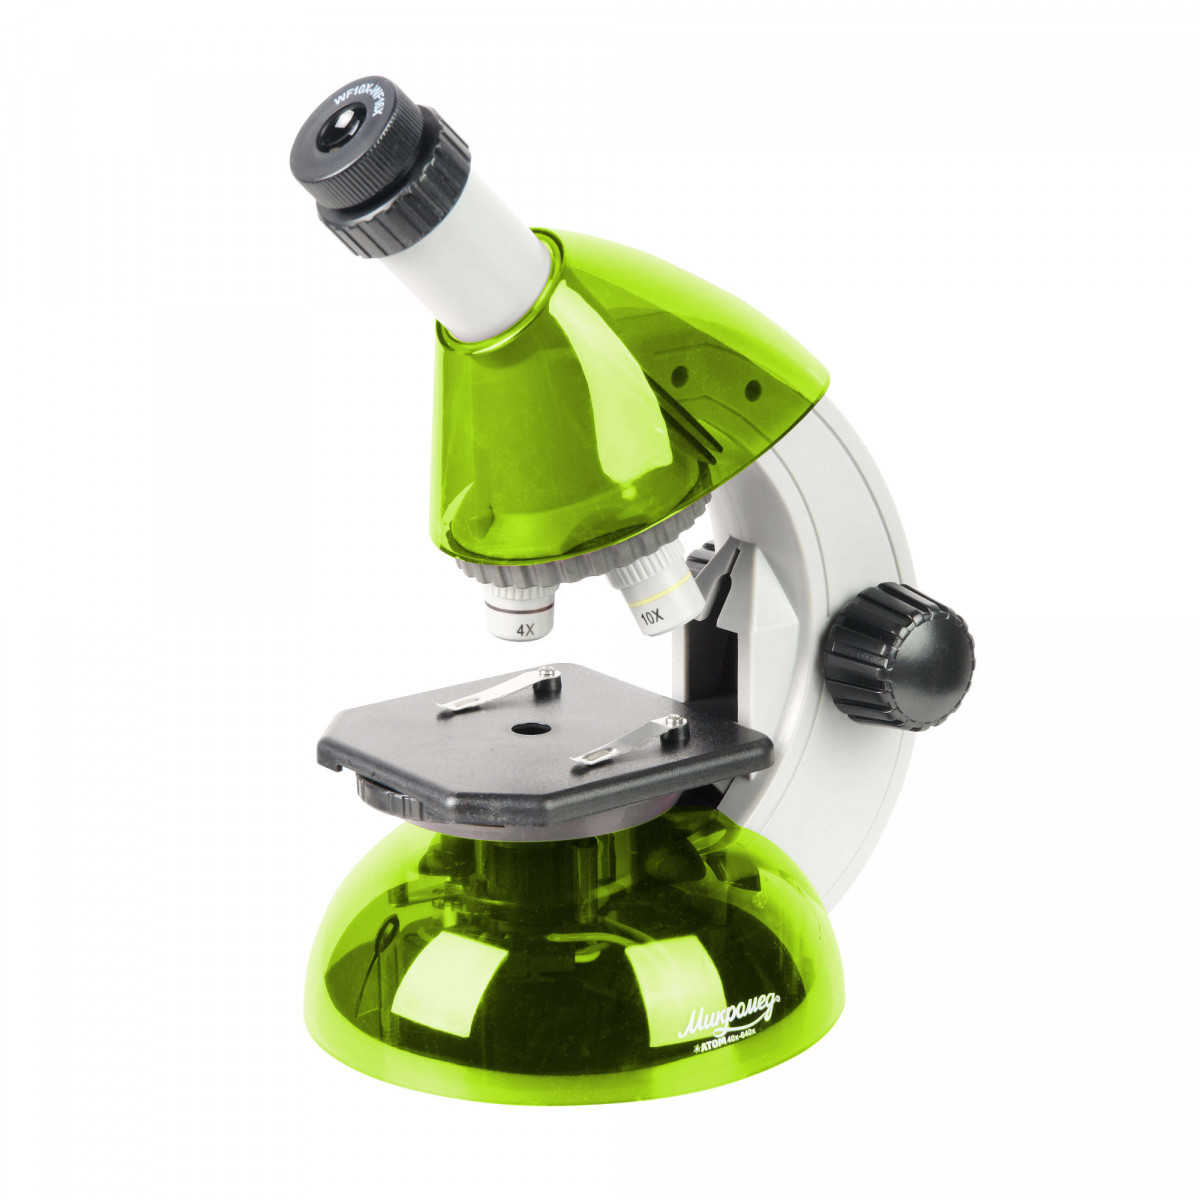 Микроскоп Микромед Атом 40x-640x